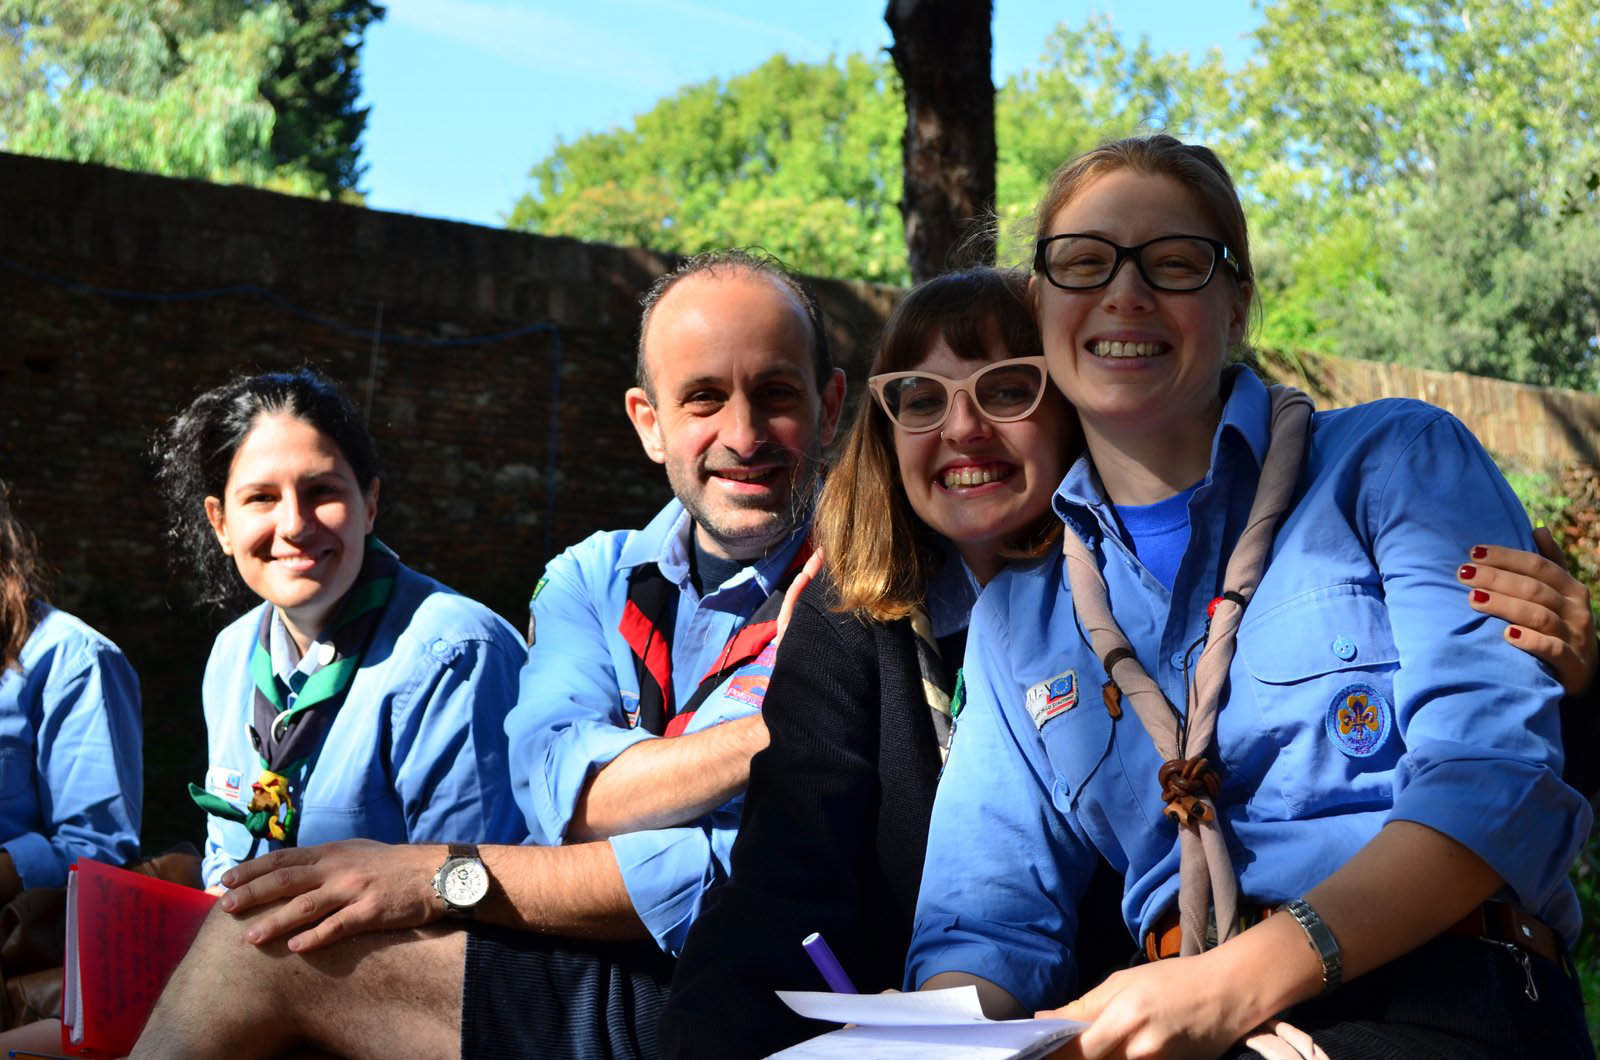 Cinquecento capi Scout a Cortona per parlare di fede e catechesi